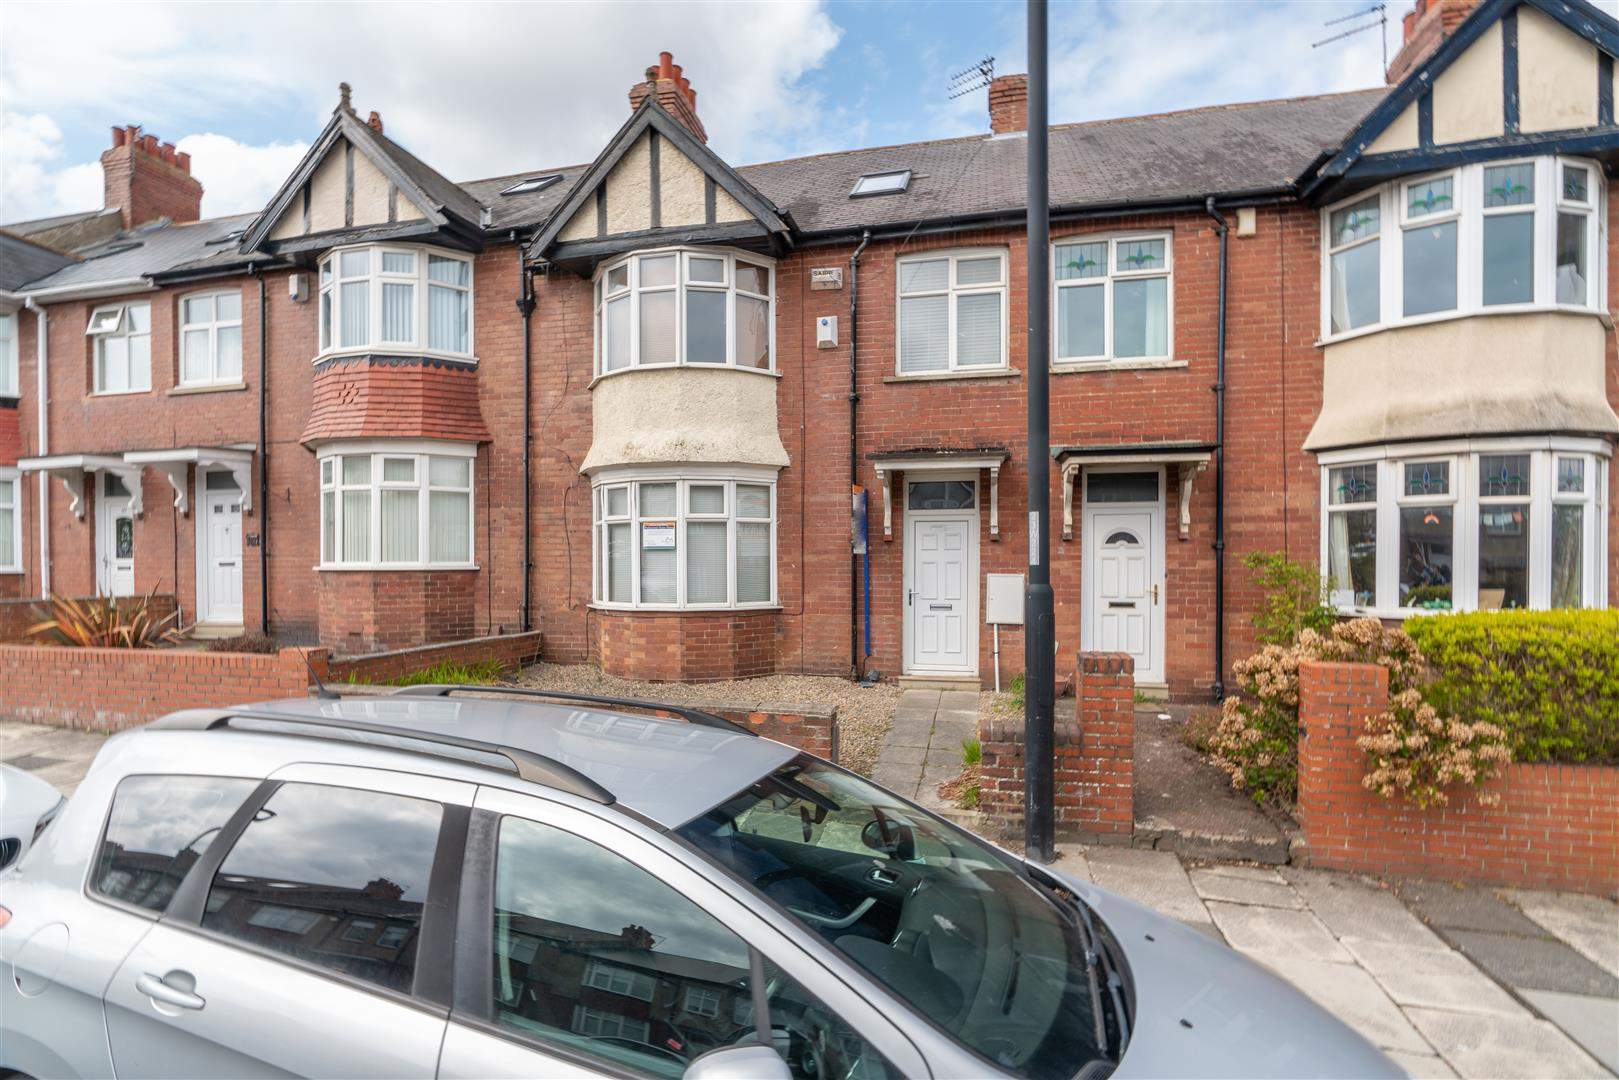 5 bed terraced house to rent in Wingrove Road, Fenham, NE4